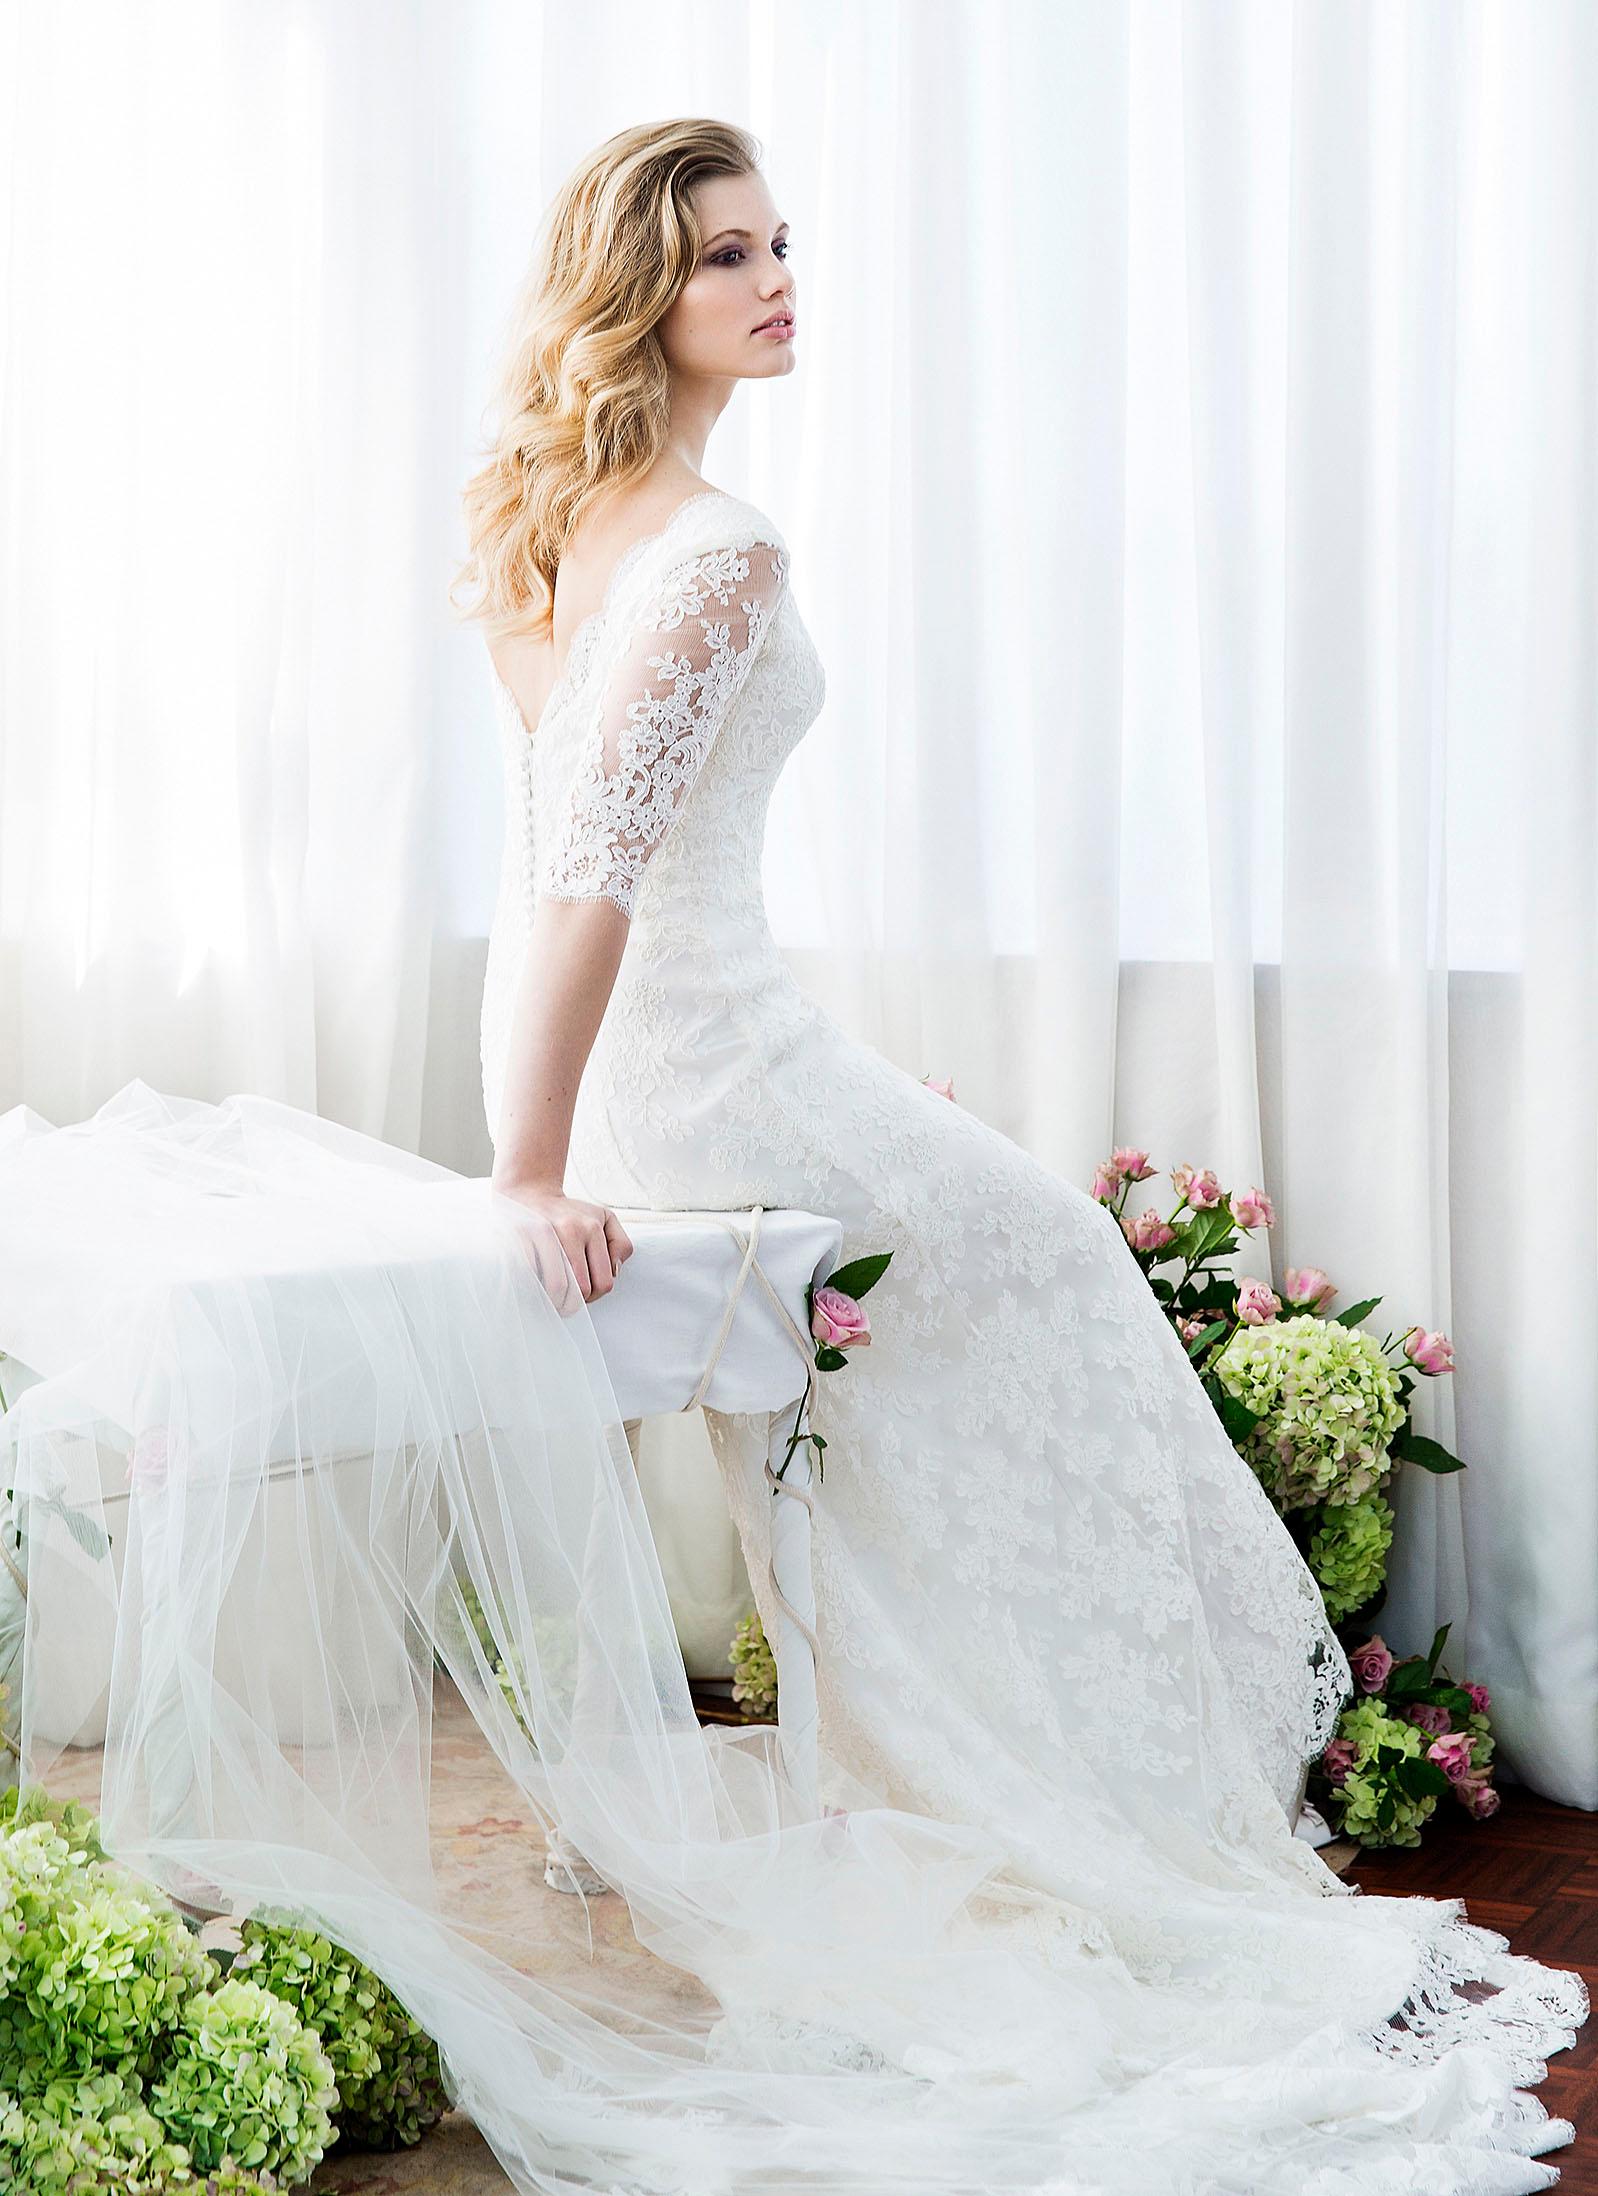 lace-sleeve-wedding-dress-3-zoom.jpg